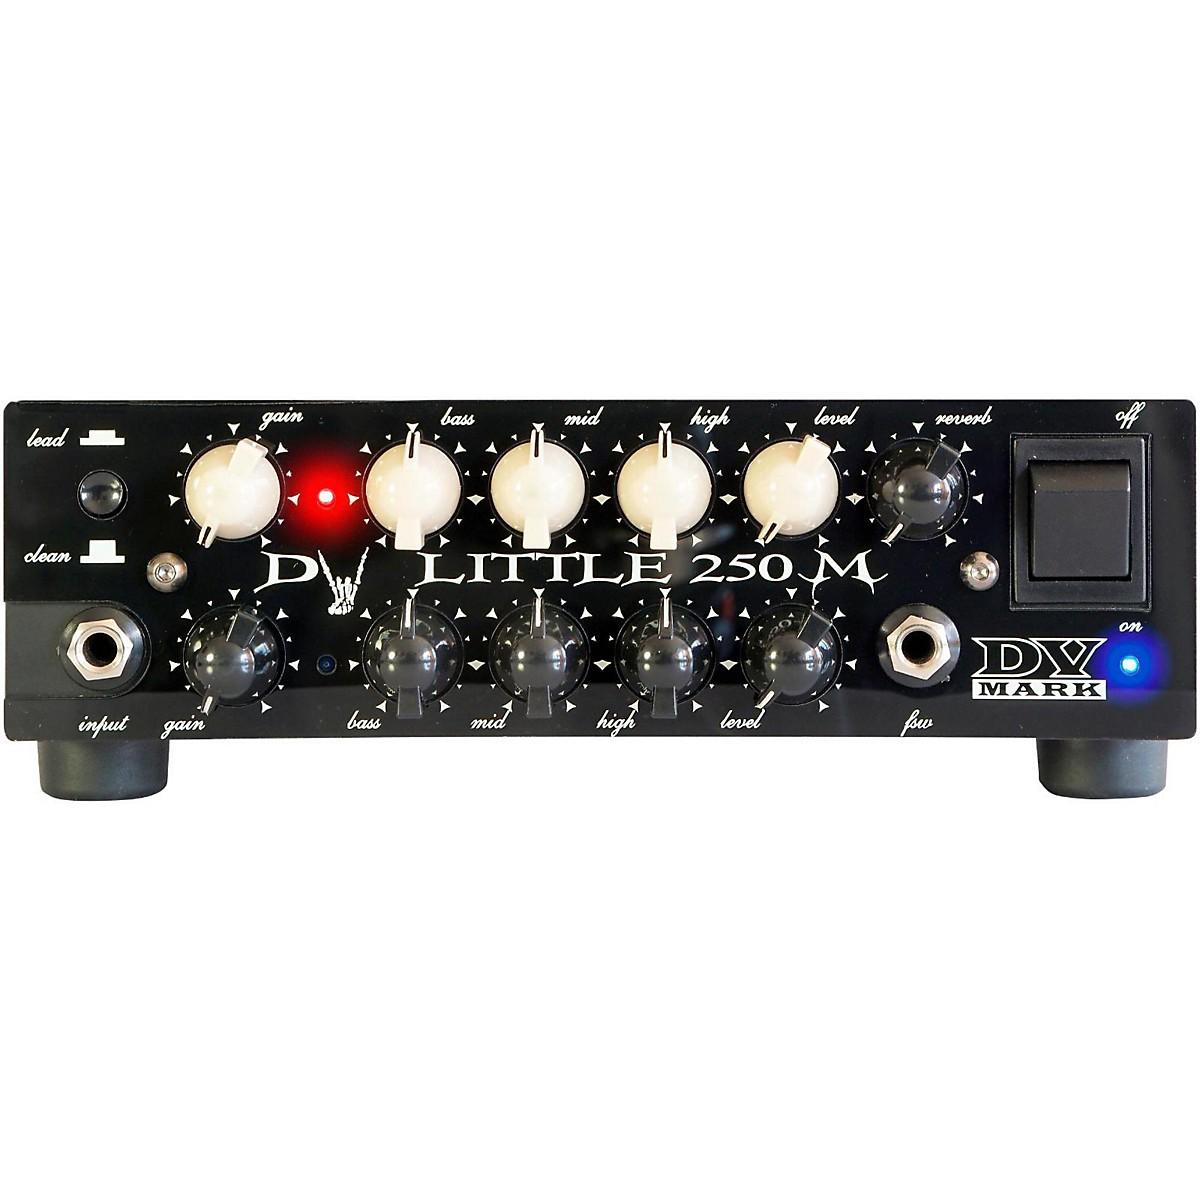 DV Mark DV Little 250 M 250W Guitar Amp Head